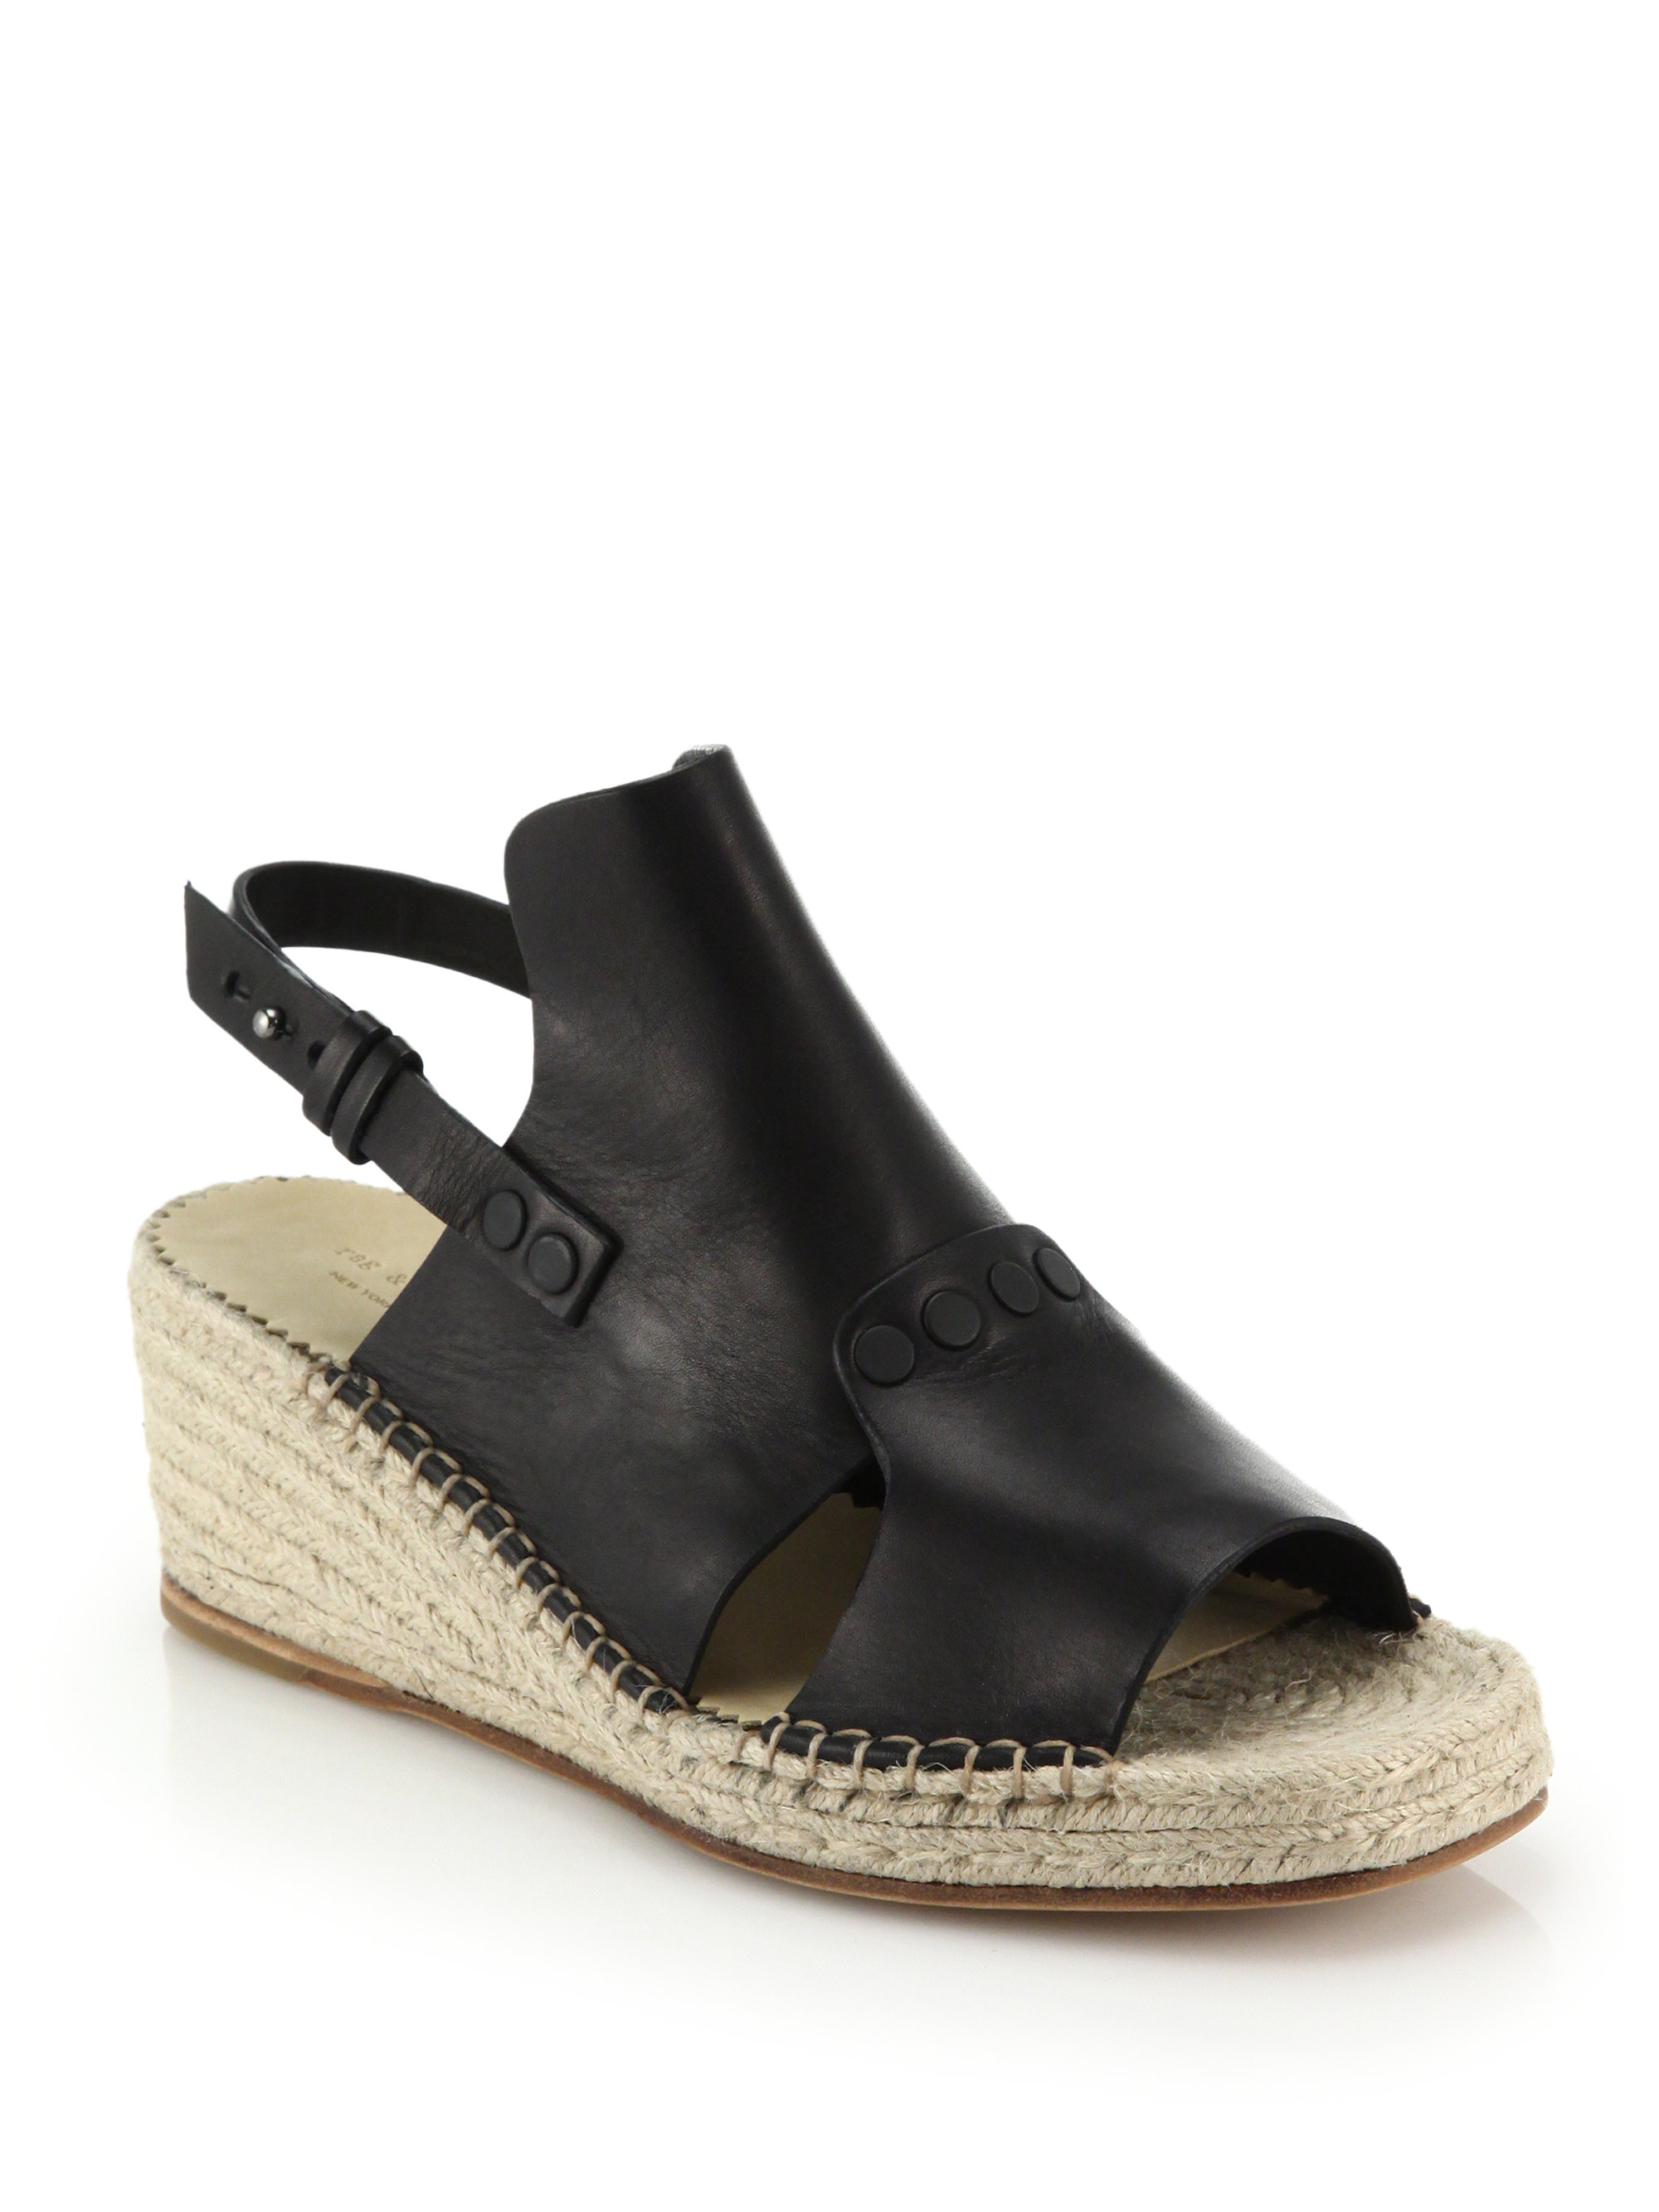 0d949f7f6ff Rag & Bone Black Sayre Ii Leather & Espadrille Wedge Sandals